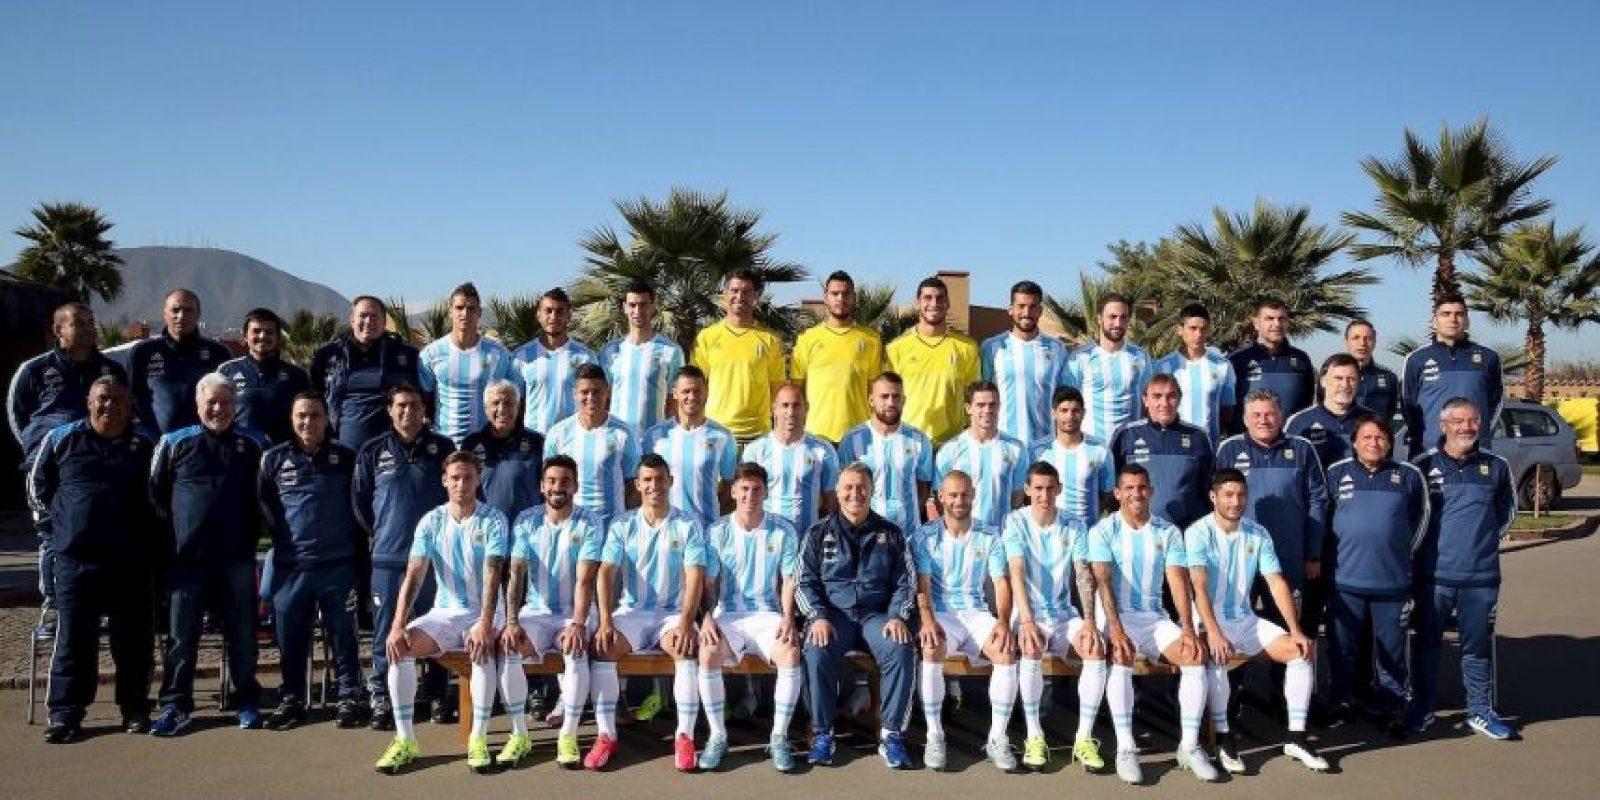 4. Argentina Foto:Vía facebook.com/AFASeleccionArgentina